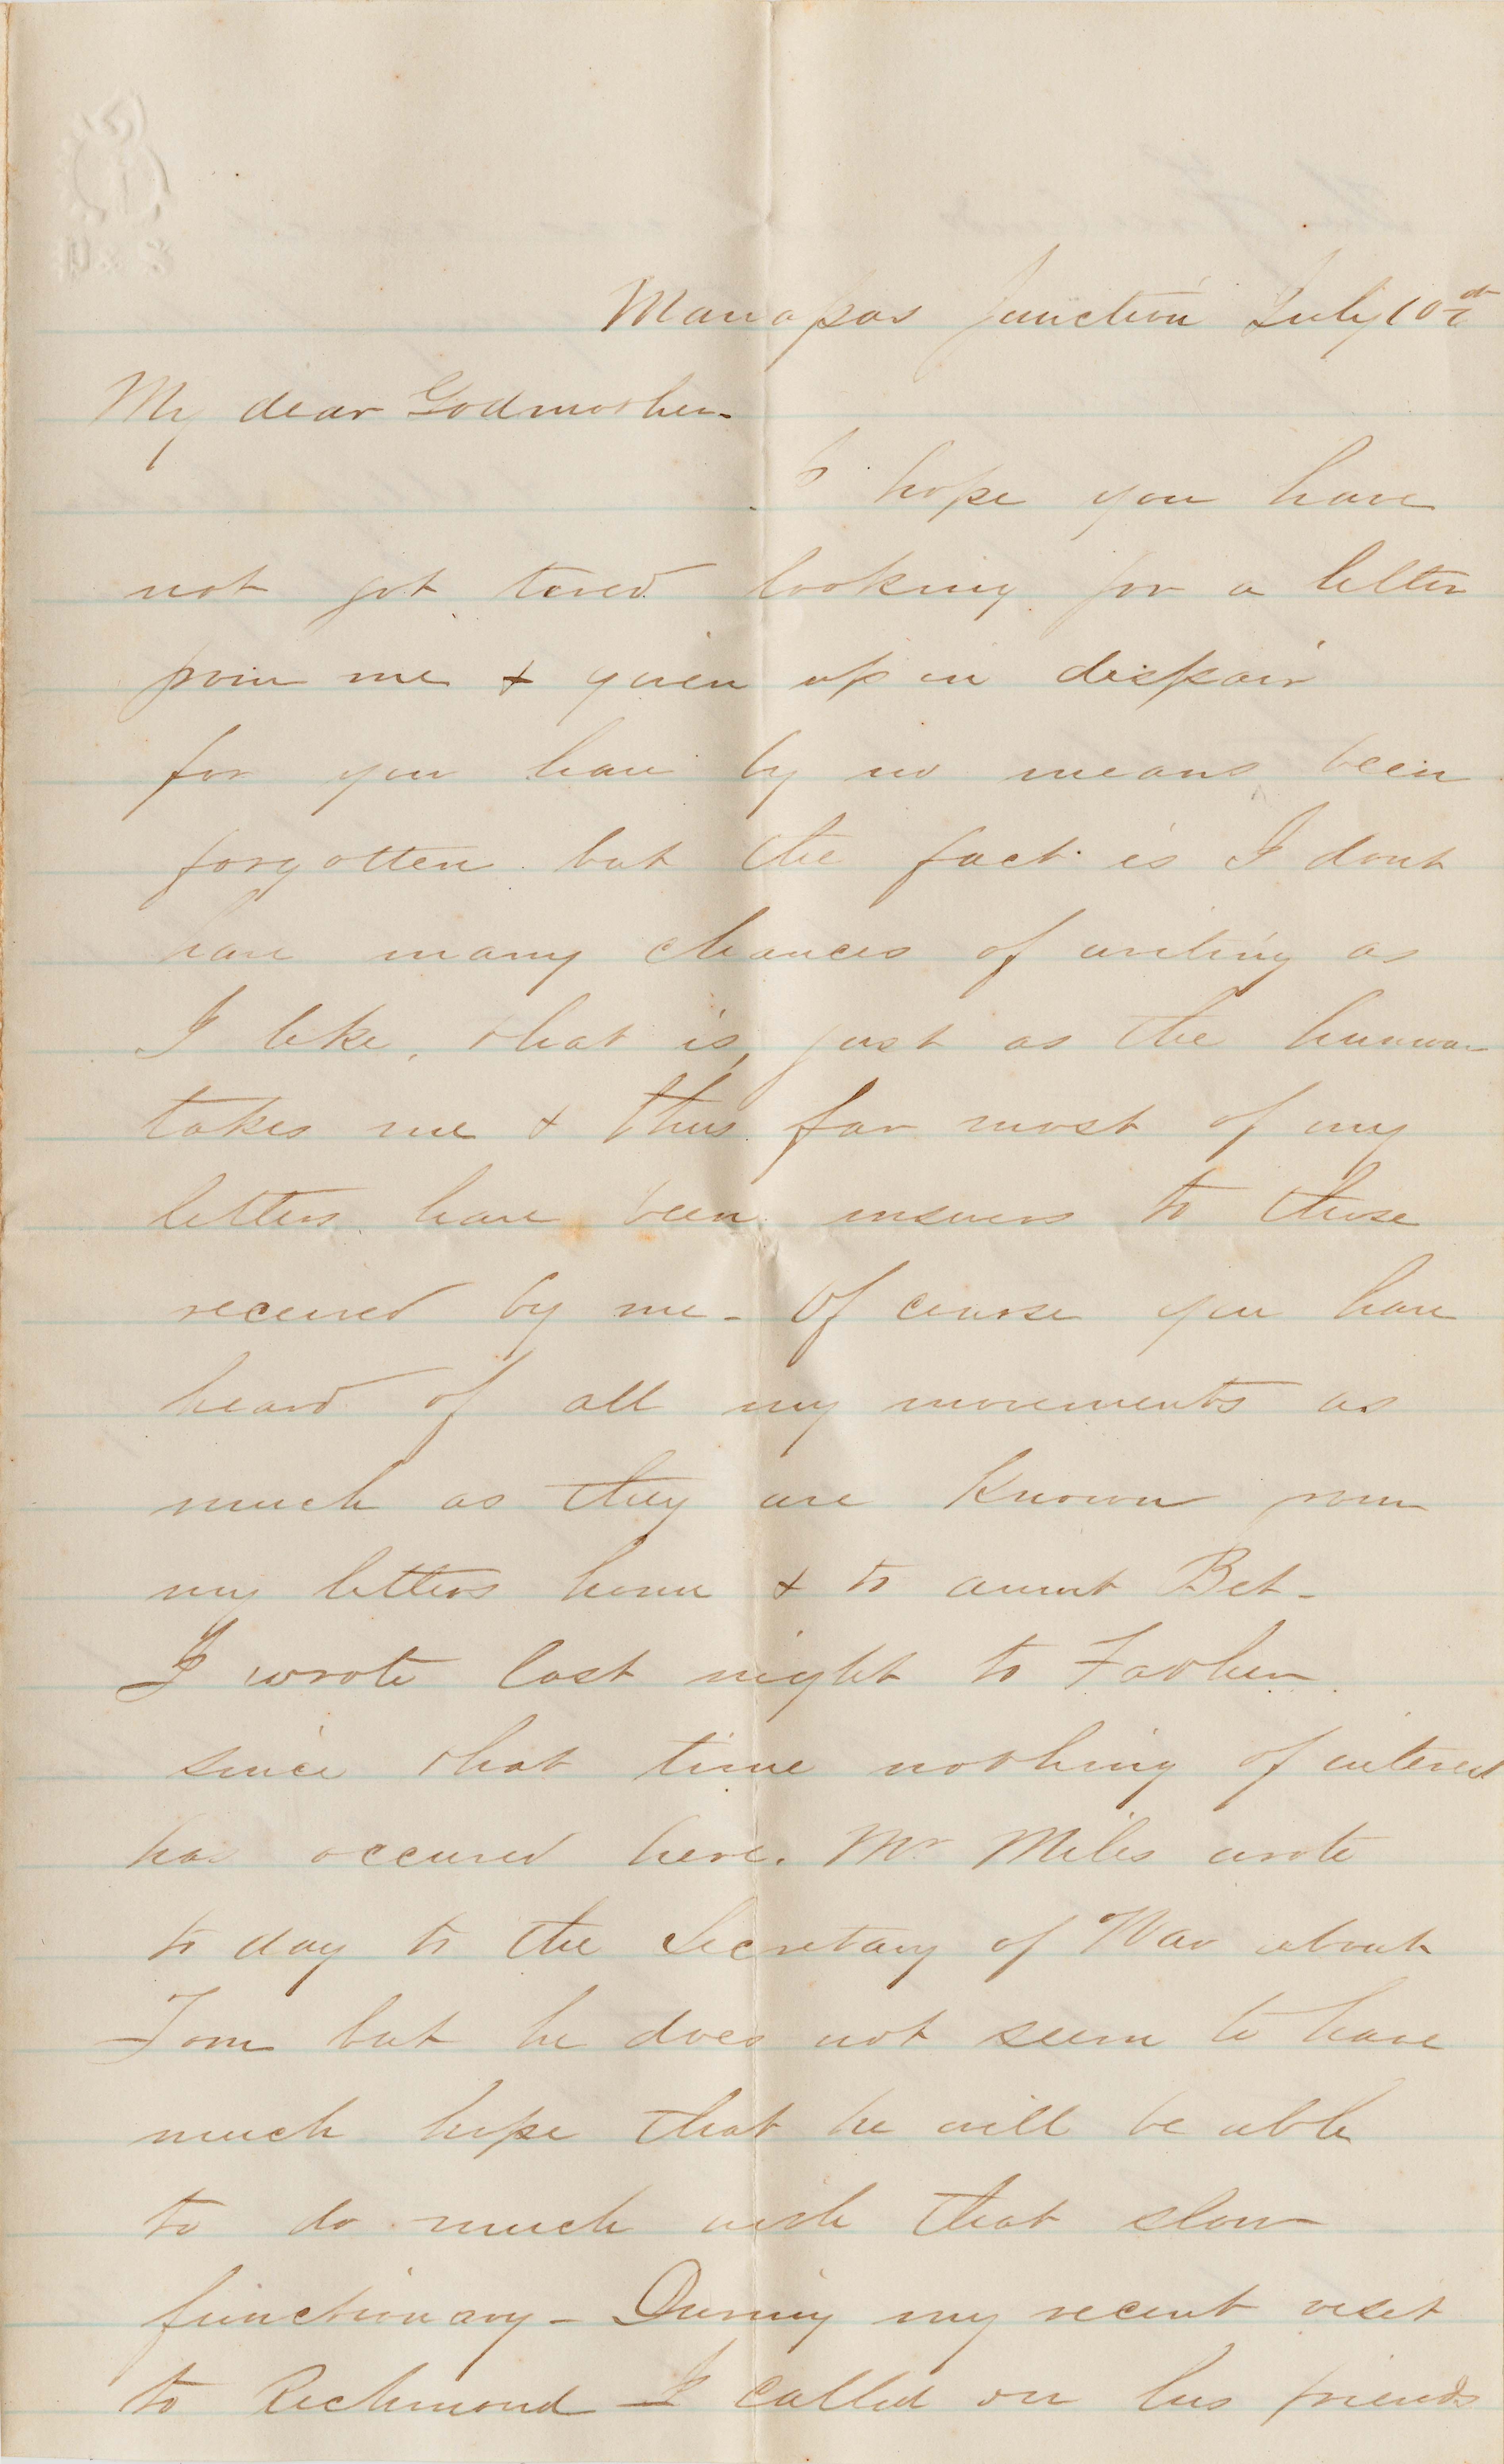 095. Samuel Wragg Ferguson to F.R. Barker (Godmother) -- July 10, 1861